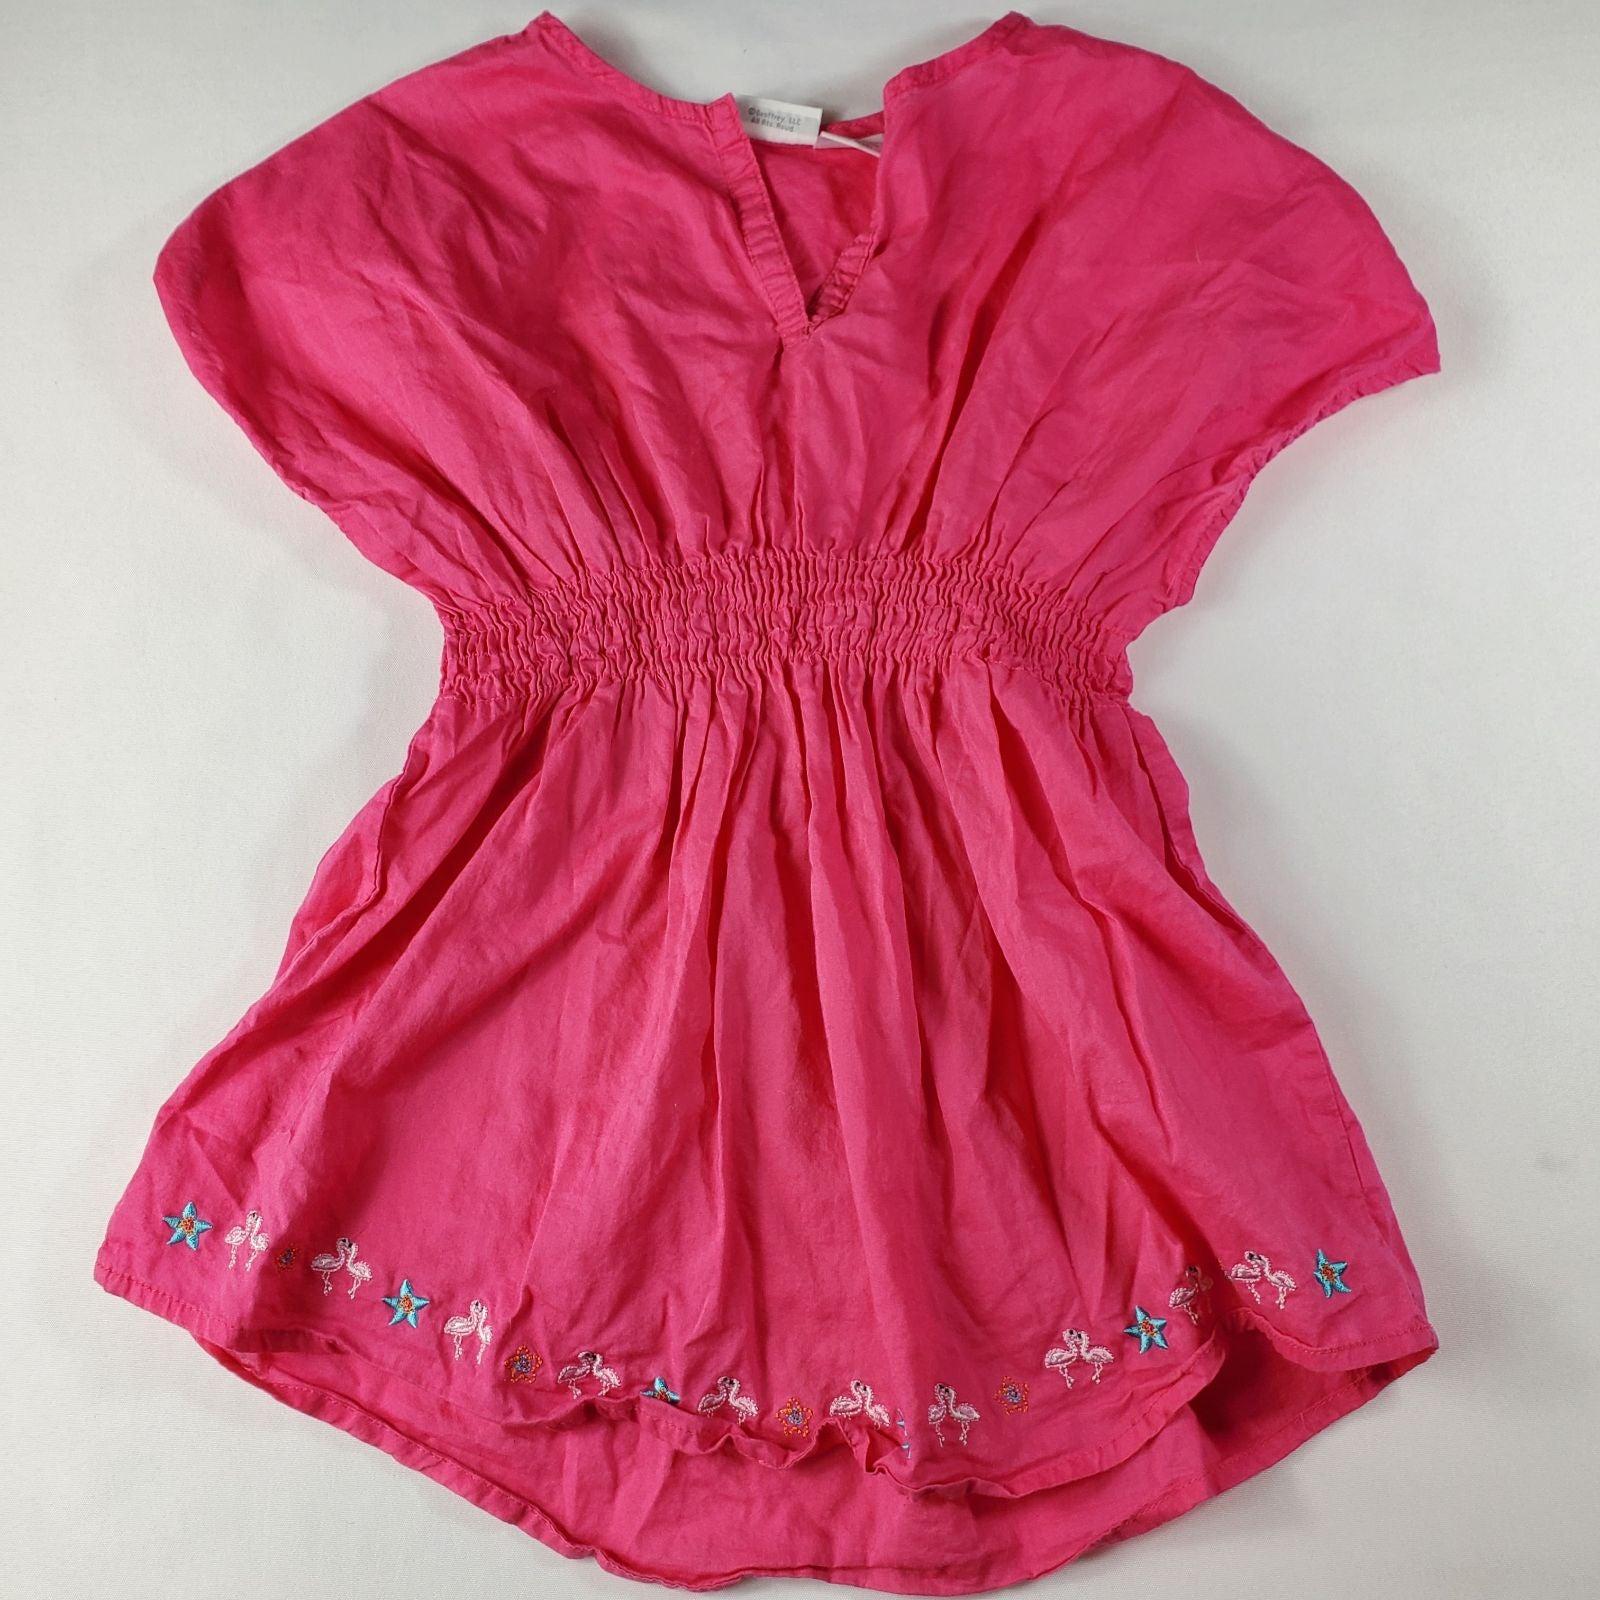 Flamingo Top Girls size 7